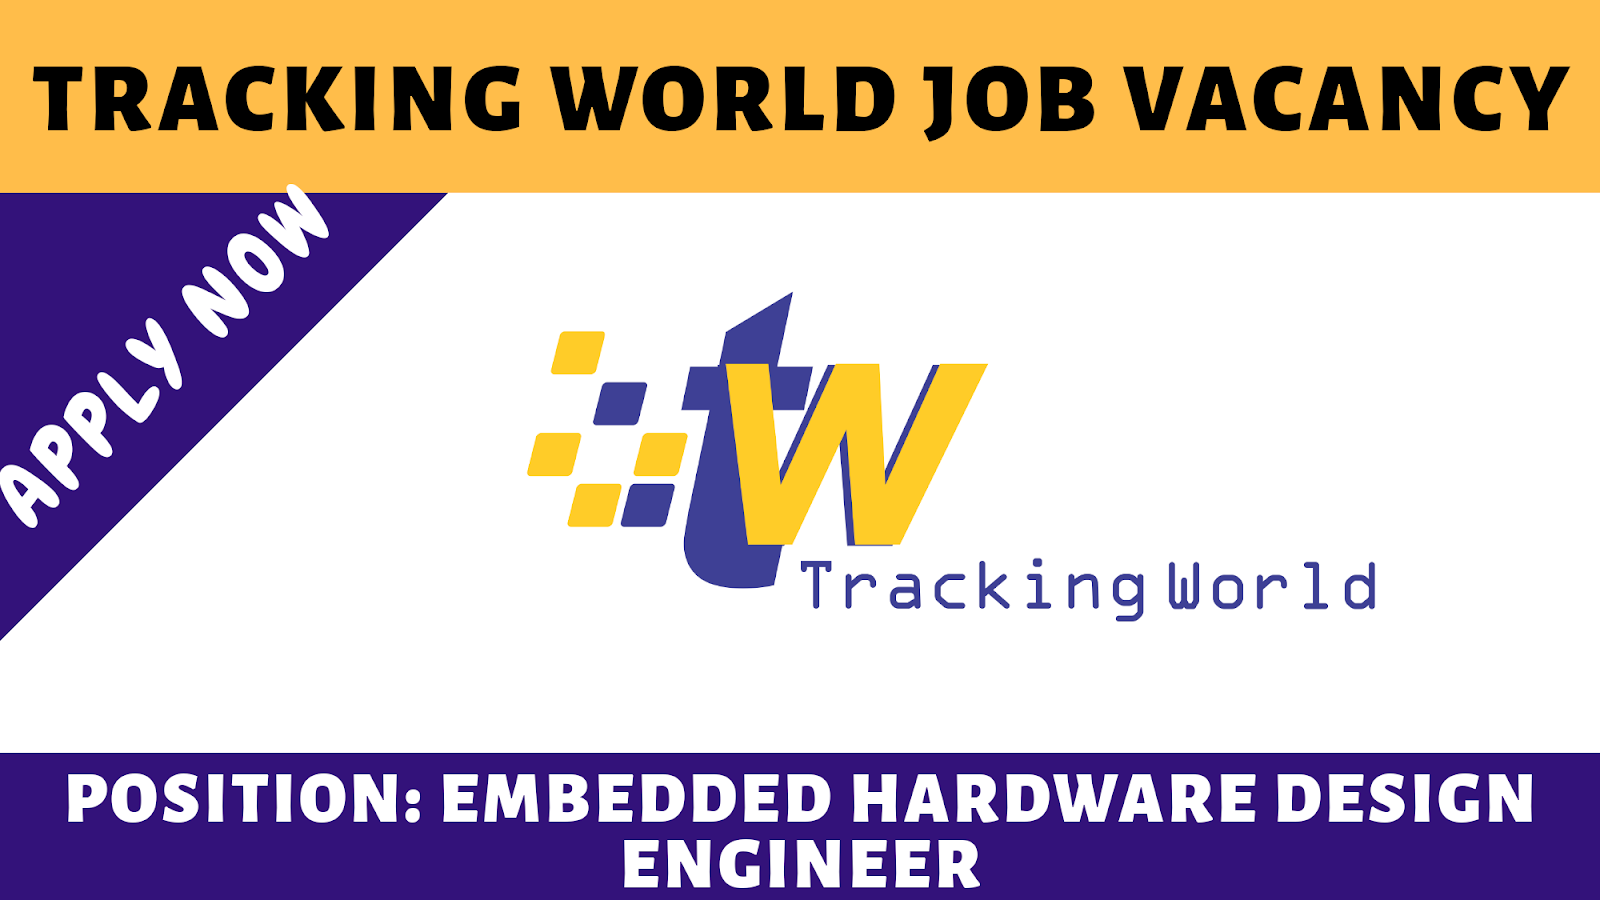 Tracking World Job Embedded Hardware Design Engineer 2019 Engineering Career Opportunities